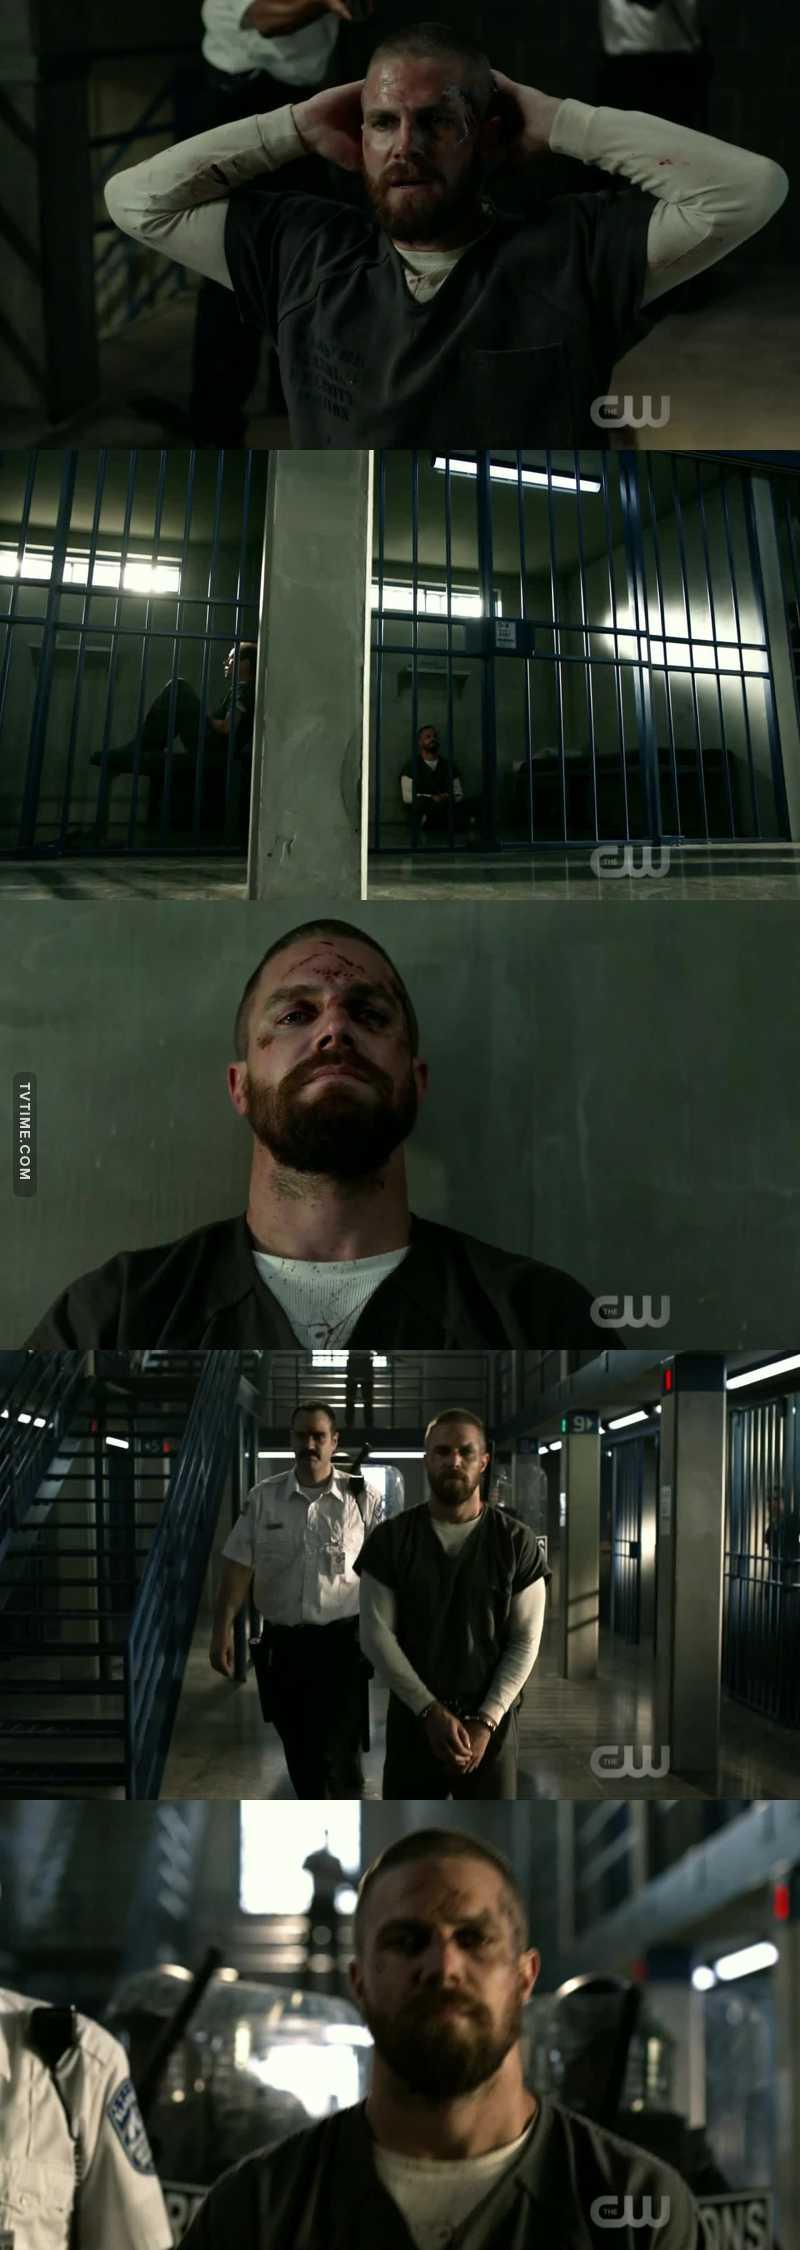 In the next episode of prisons break , kkkkk